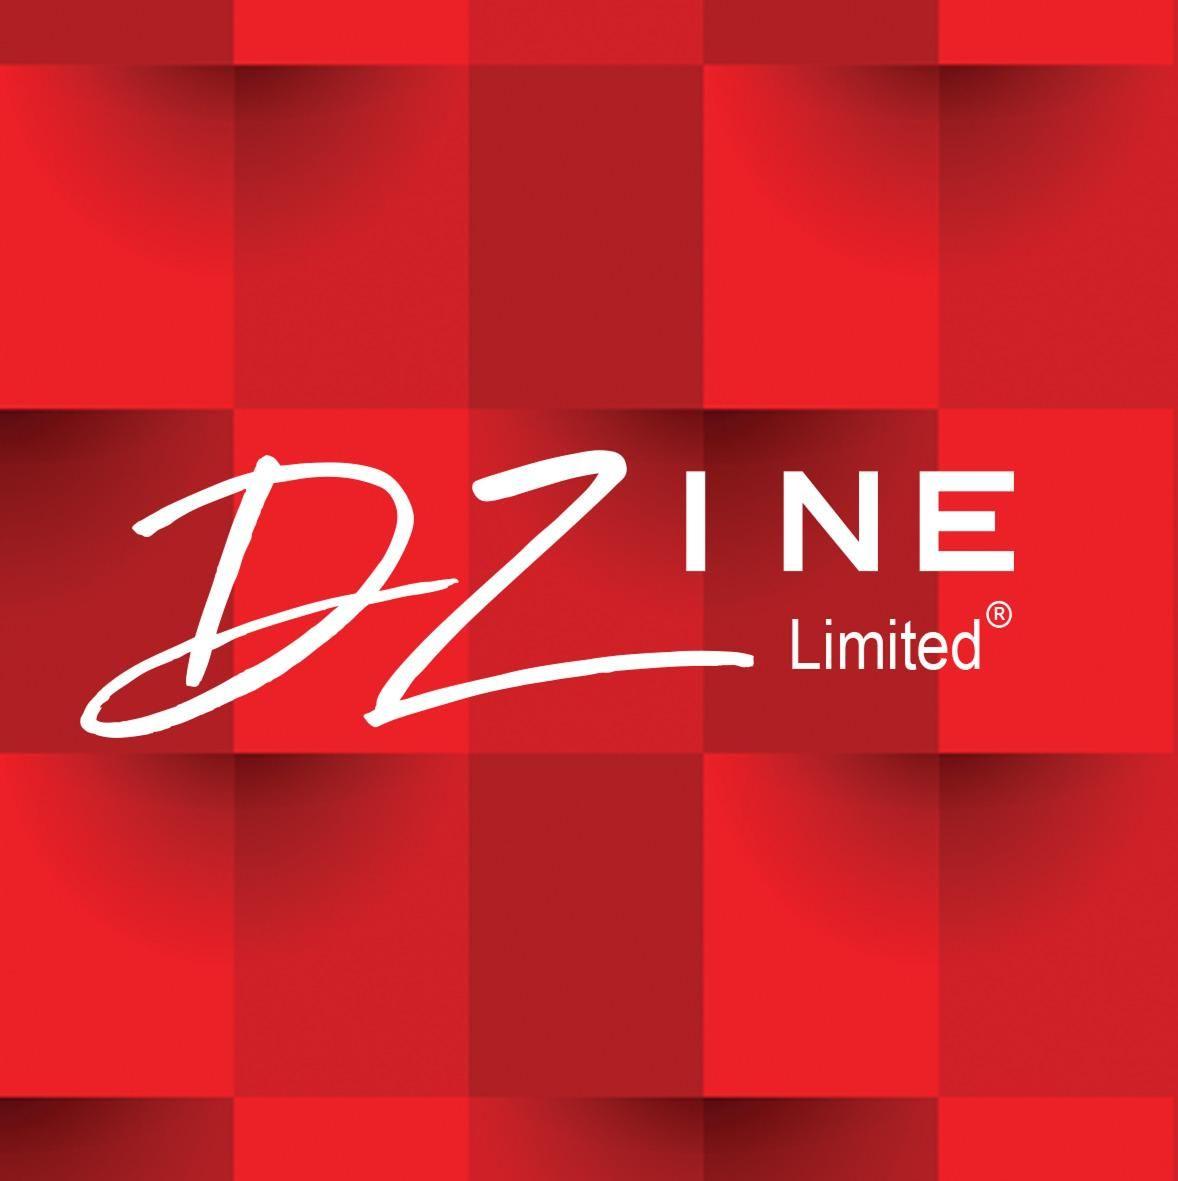 DZine Ltd